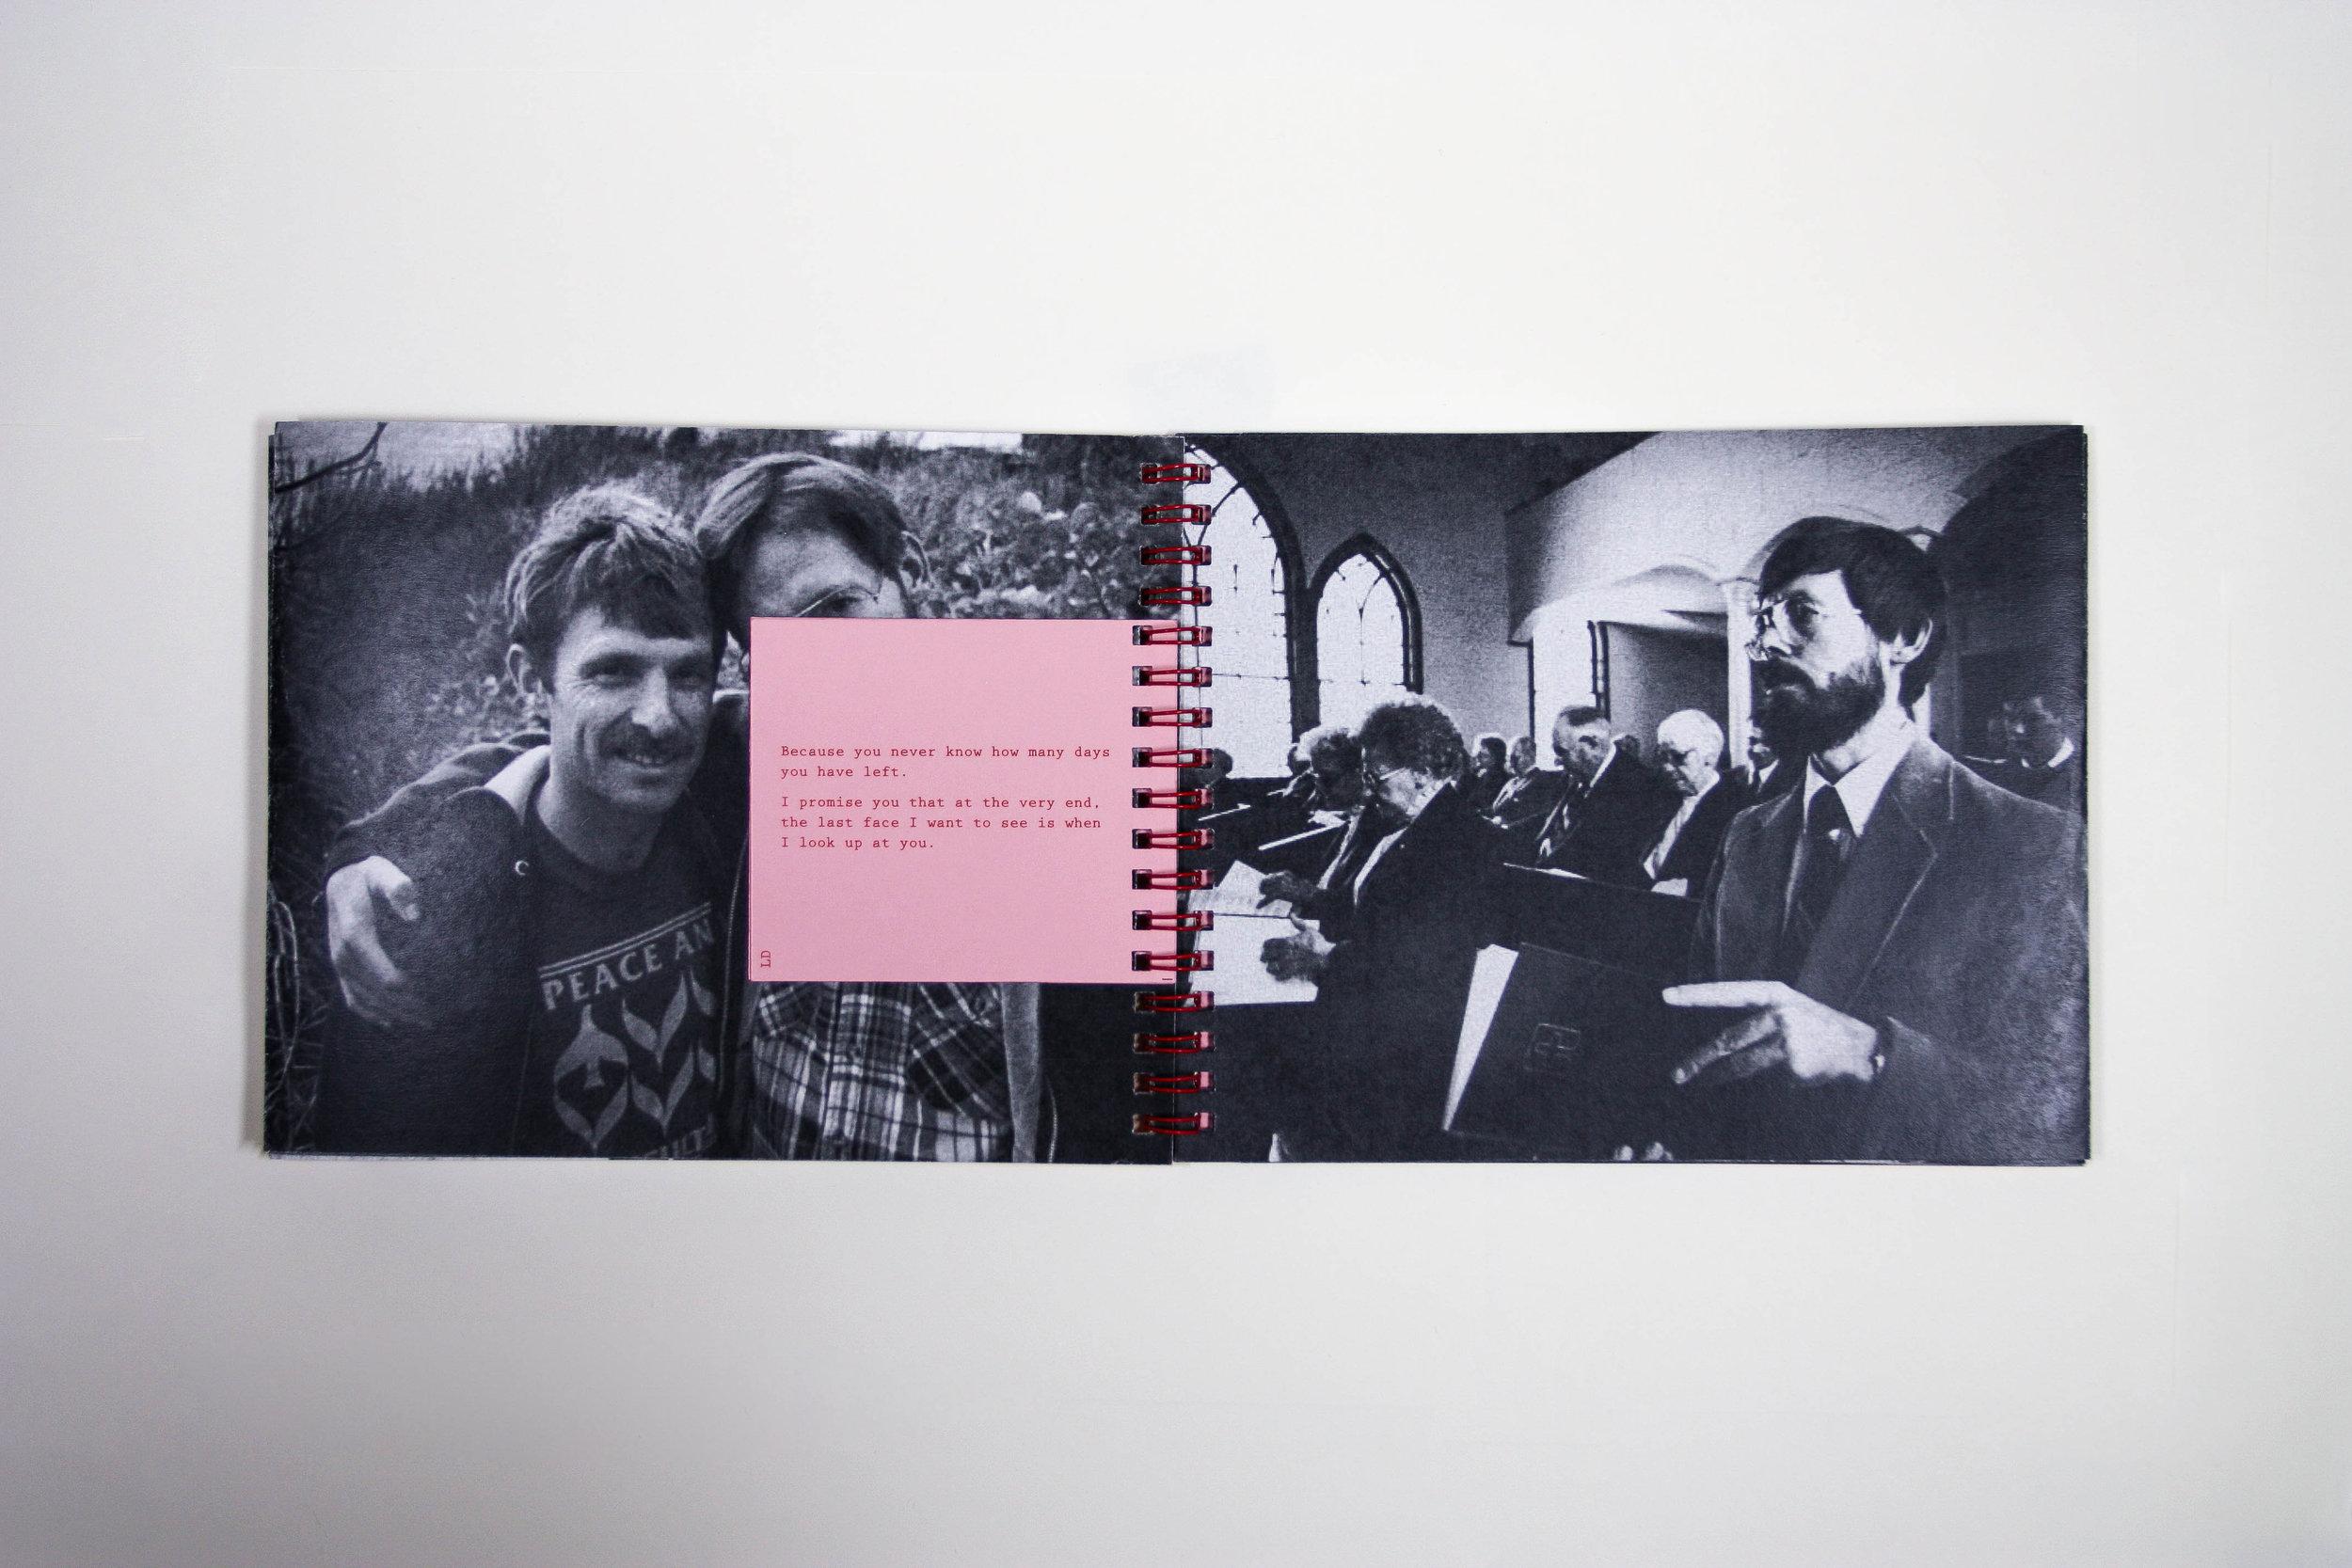 estory-bookimages-18.jpg